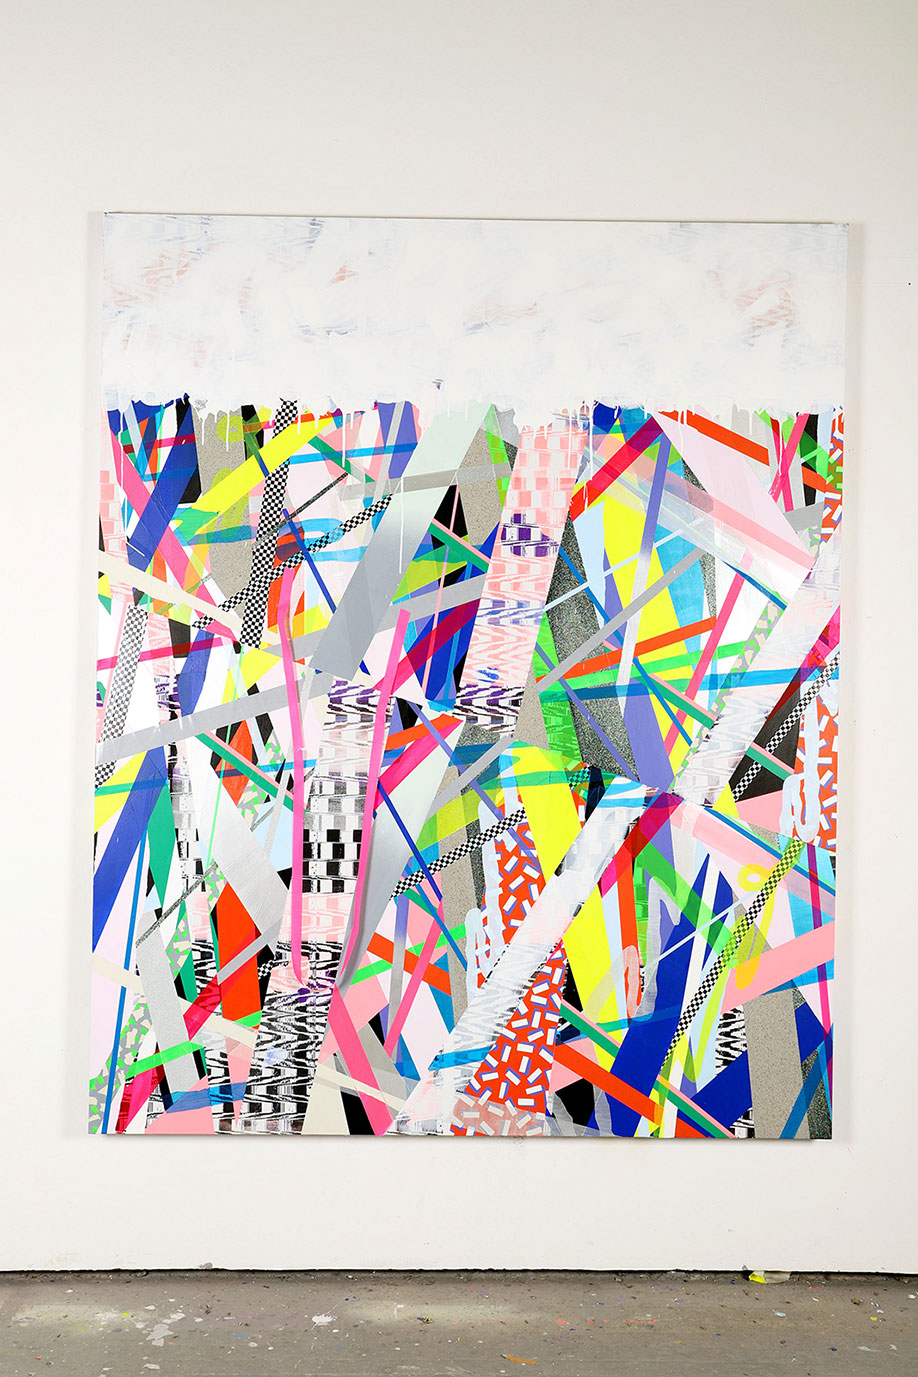 <b>Title:&nbsp;</b>Fahren<br /><b>Year:&nbsp;</b>2018<br /><b>Medium:&nbsp;</b>Mixed media on canvas<br /><b>Size:&nbsp;</b>210 x 170 x 3.5 cm